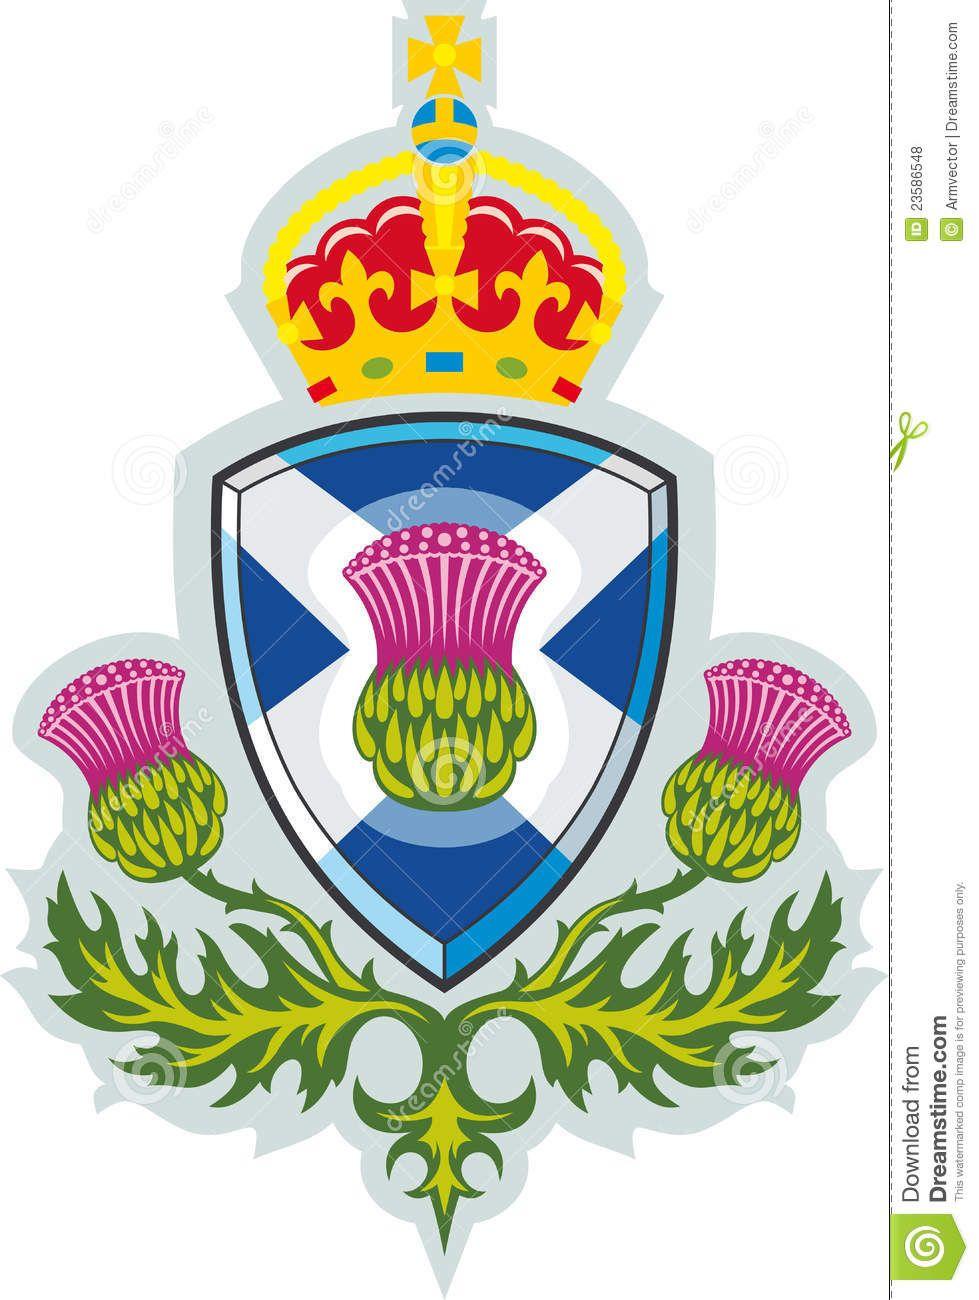 Scottish Thistle Mbol Of Scotland Scotland Pinterest